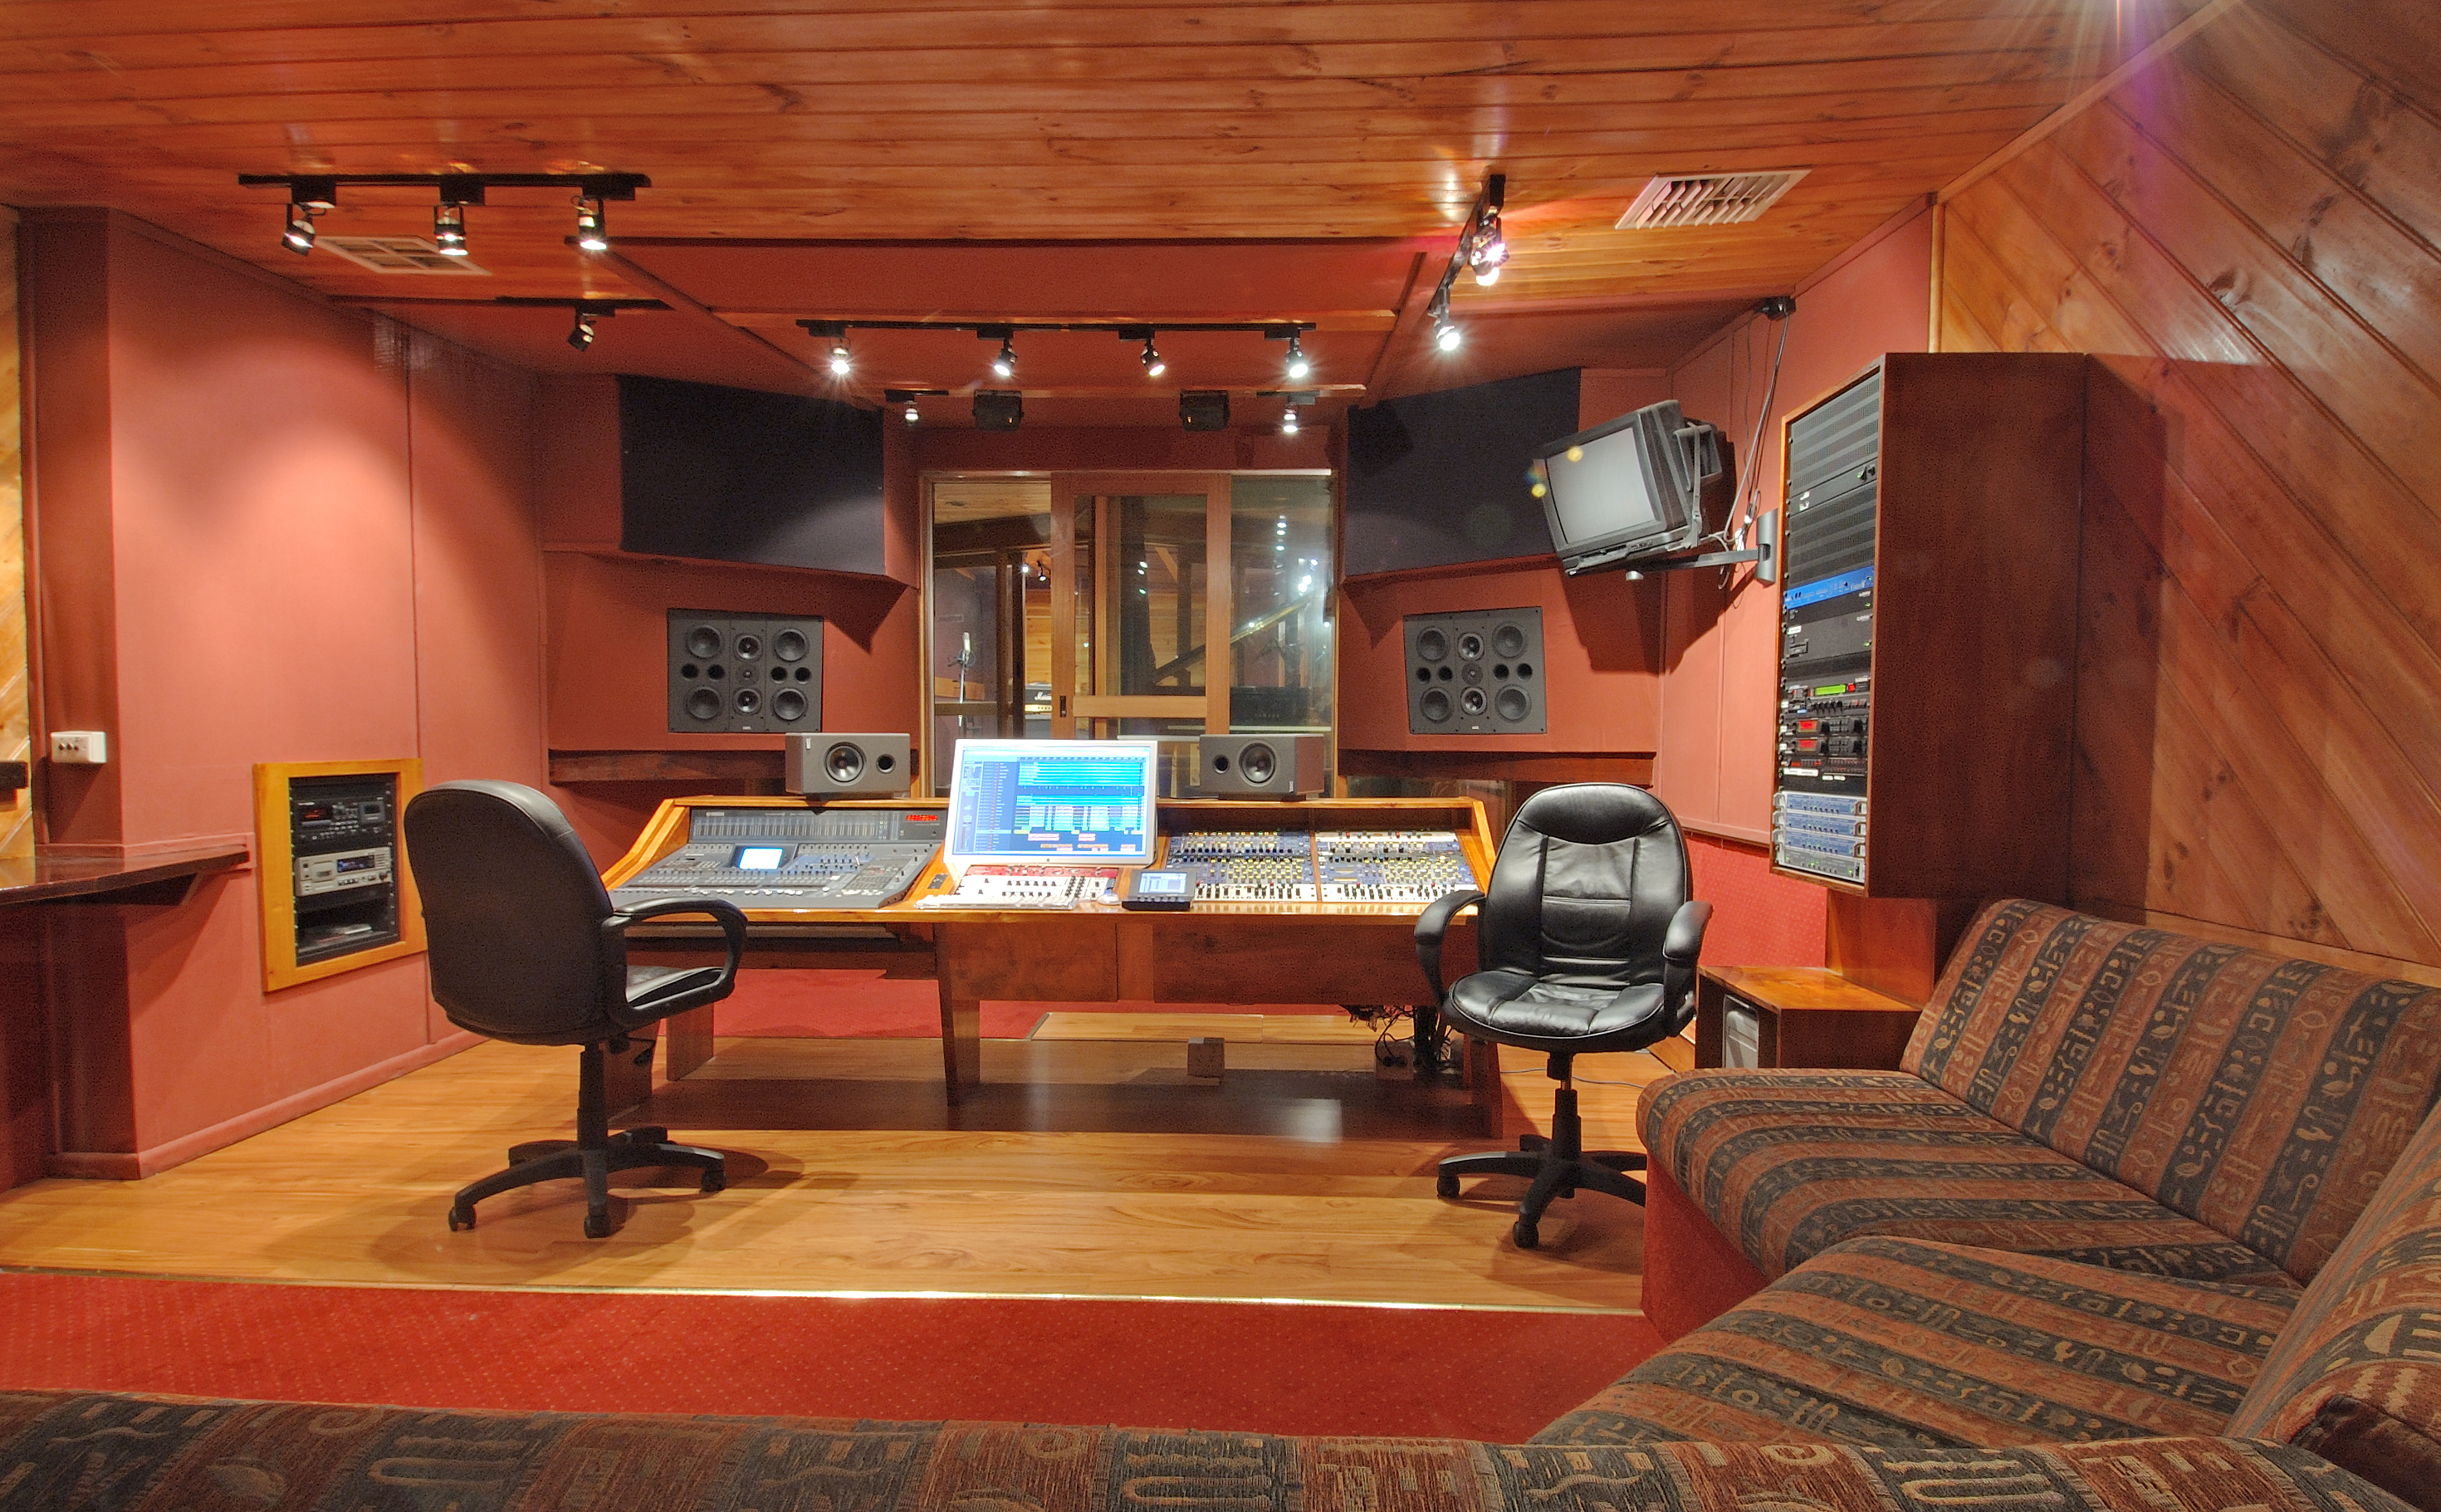 Studio 52 A studio